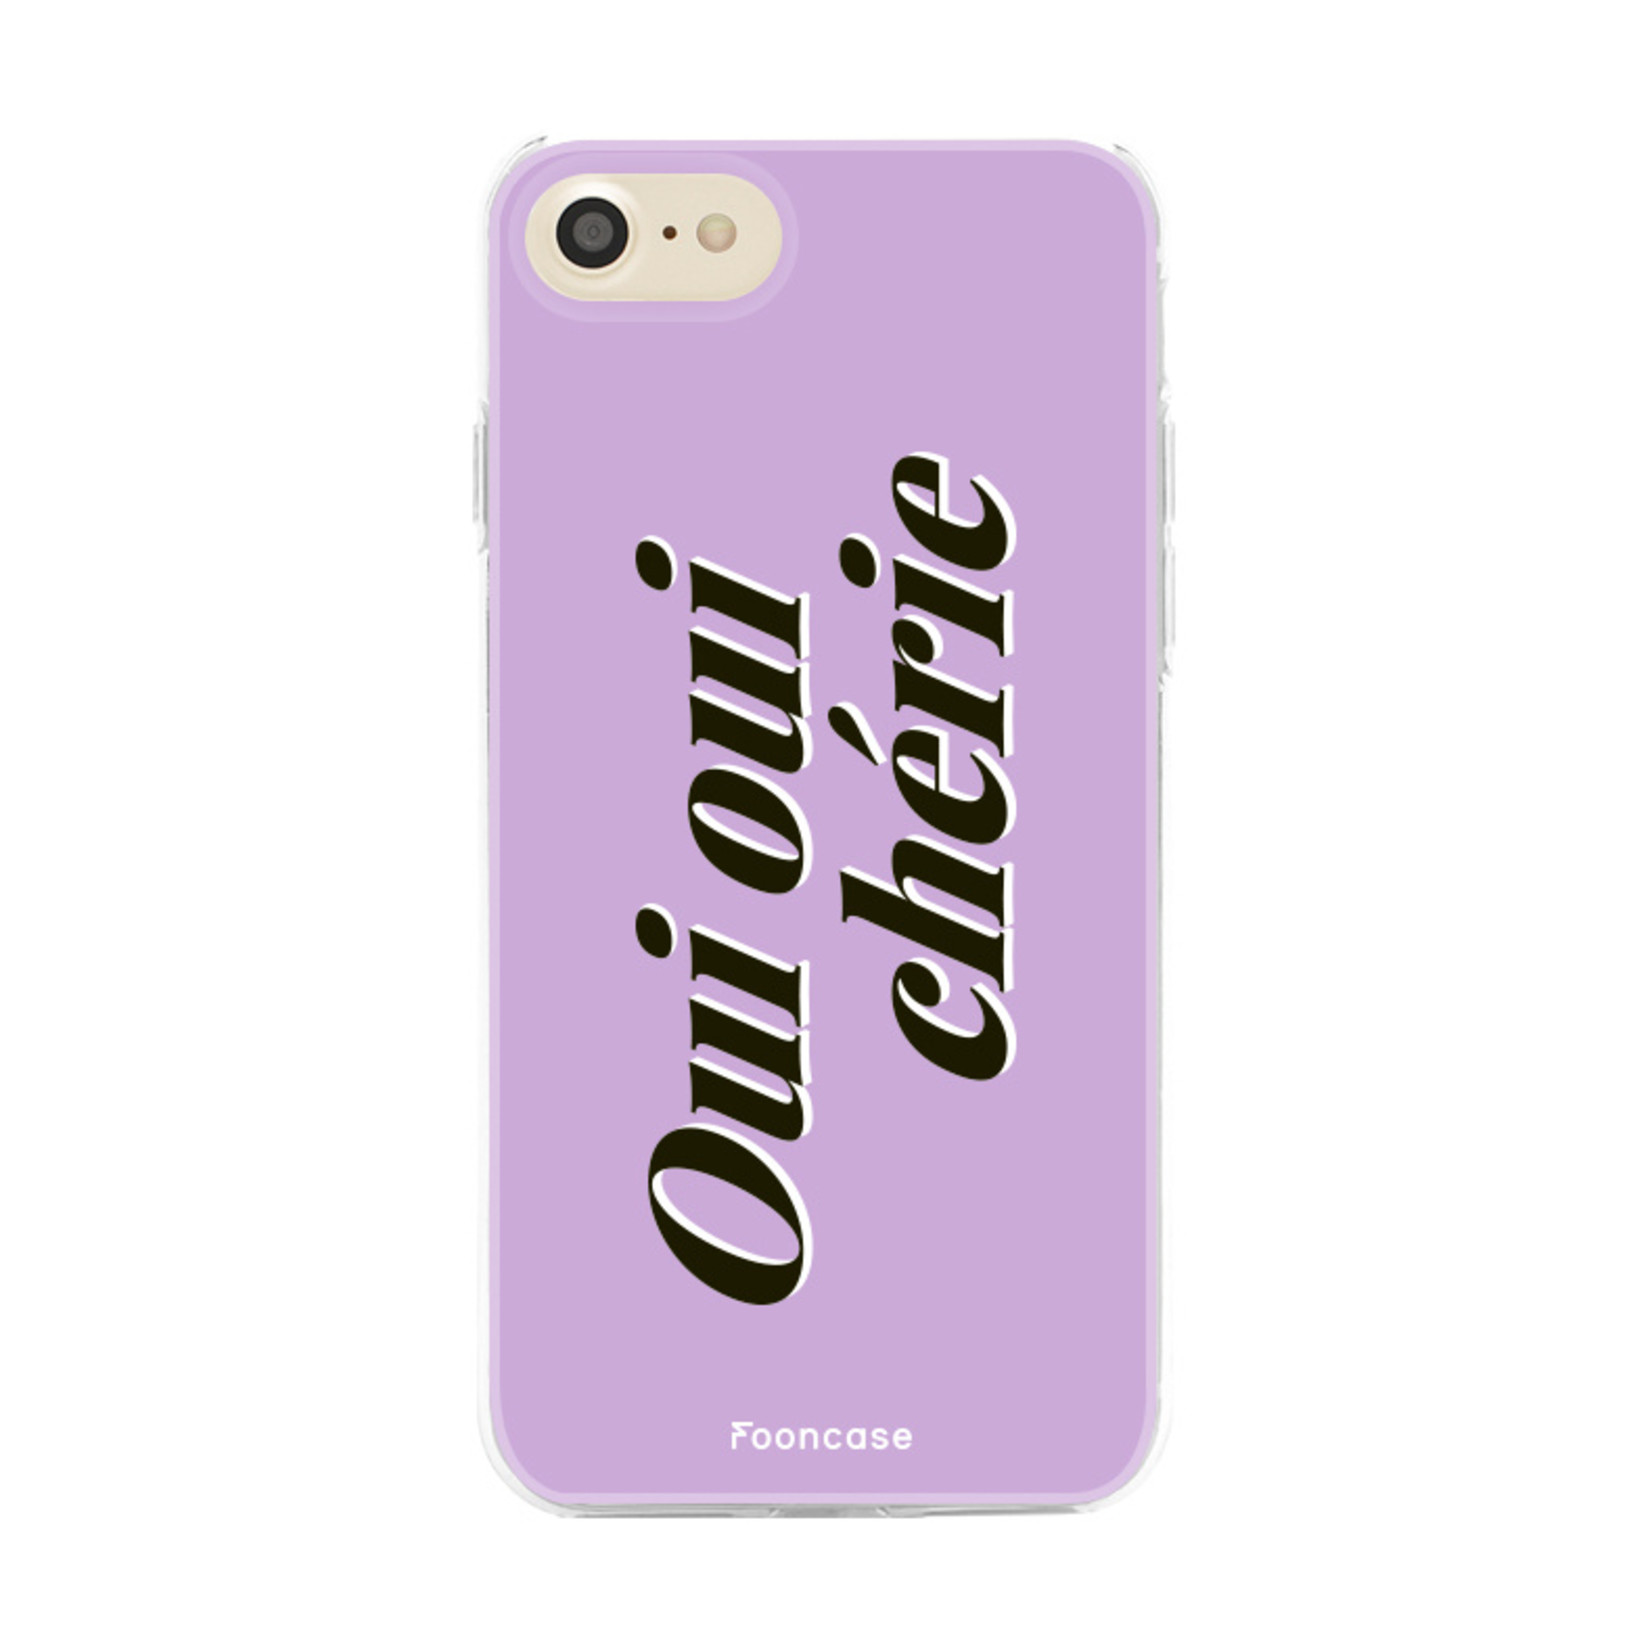 FOONCASE iPhone 7 hoesje TPU Soft Case - Back Cover - Oui Oui Chérie / Lila Paars & Wit